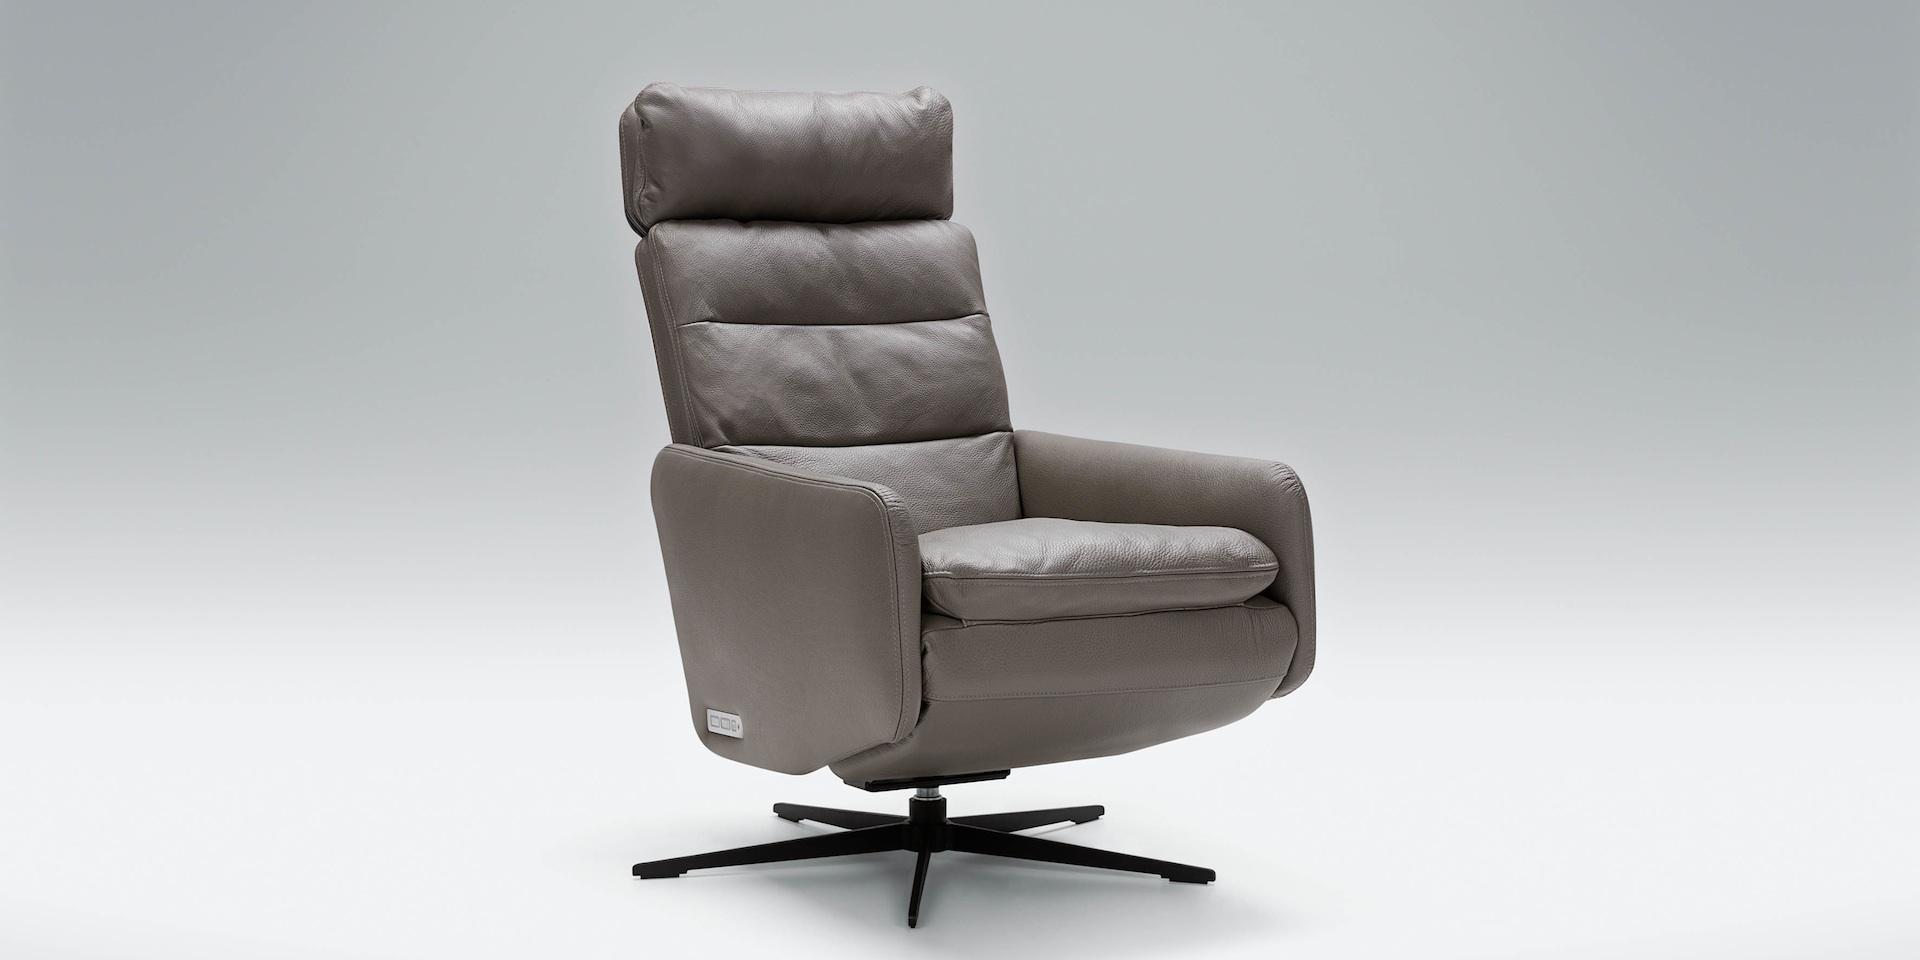 LIV_RELAX_shadow_armchair_touch5_dark_grey_2